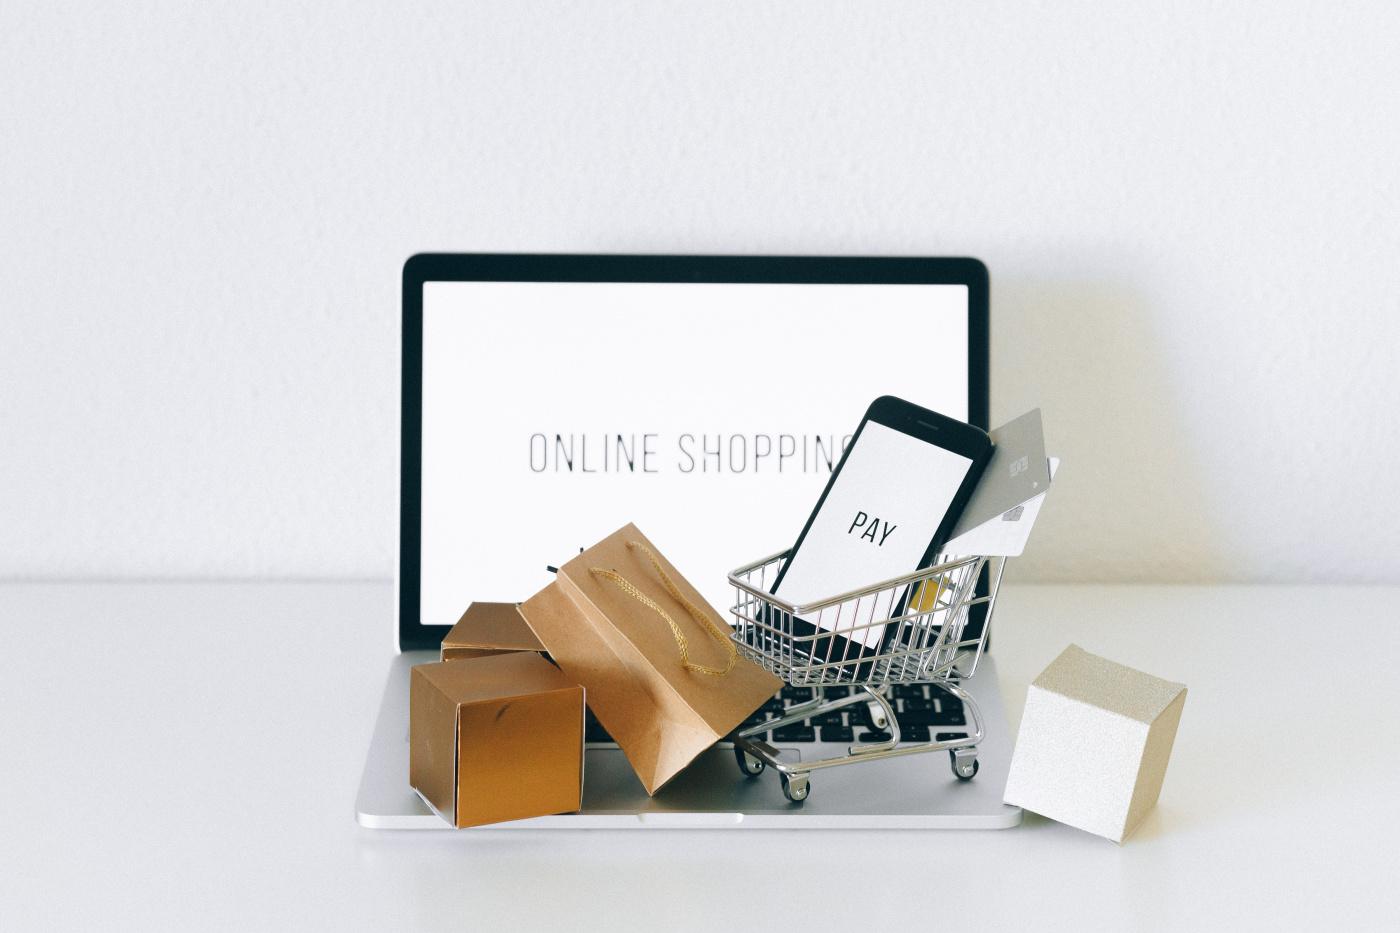 Next Gen Experiences in Today's Digital Marketplace